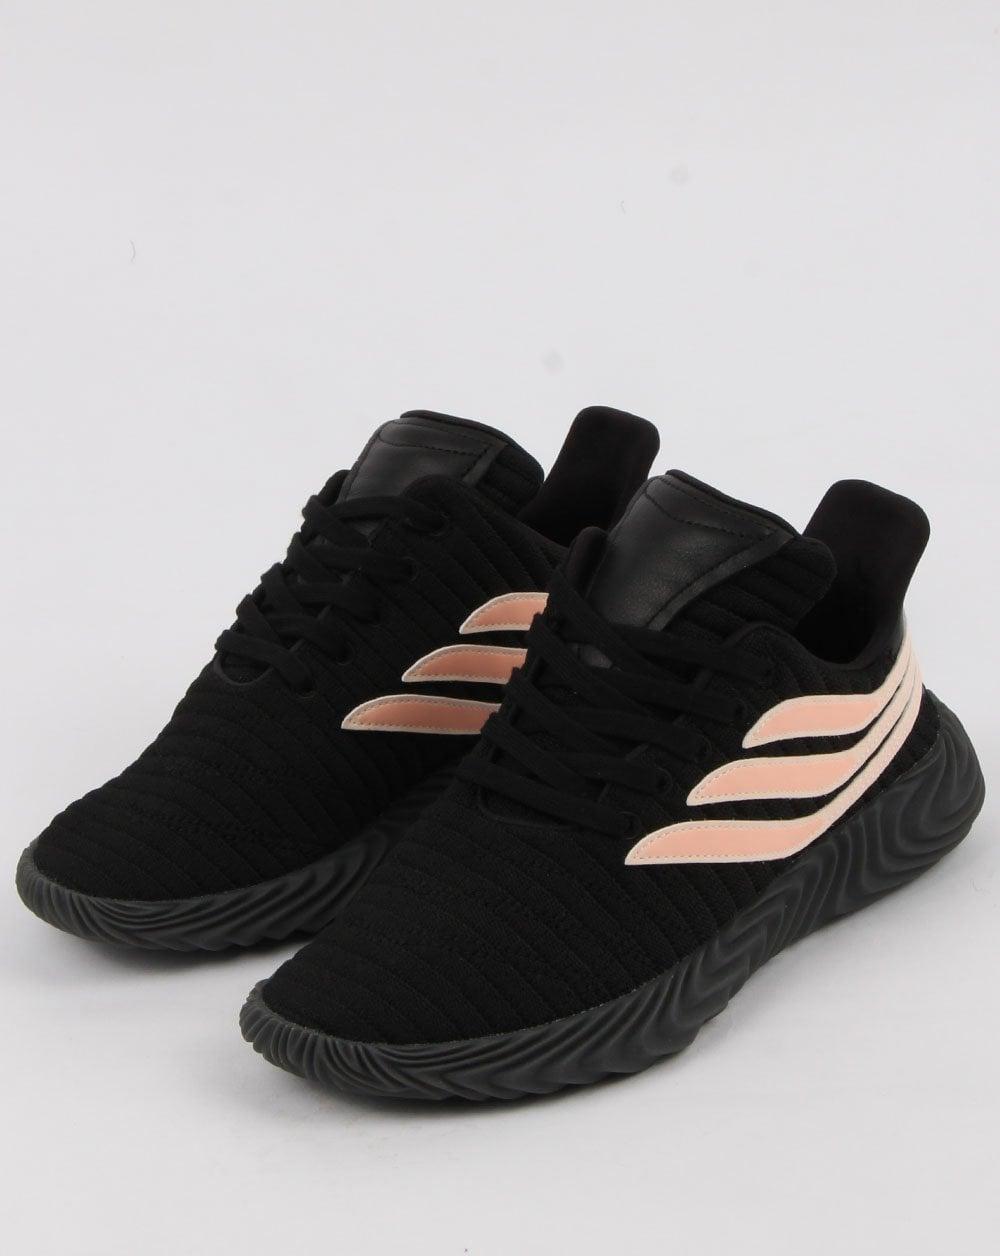 lowest price e3297 d804d Adidas Sobakov Trainers Black clear Orange